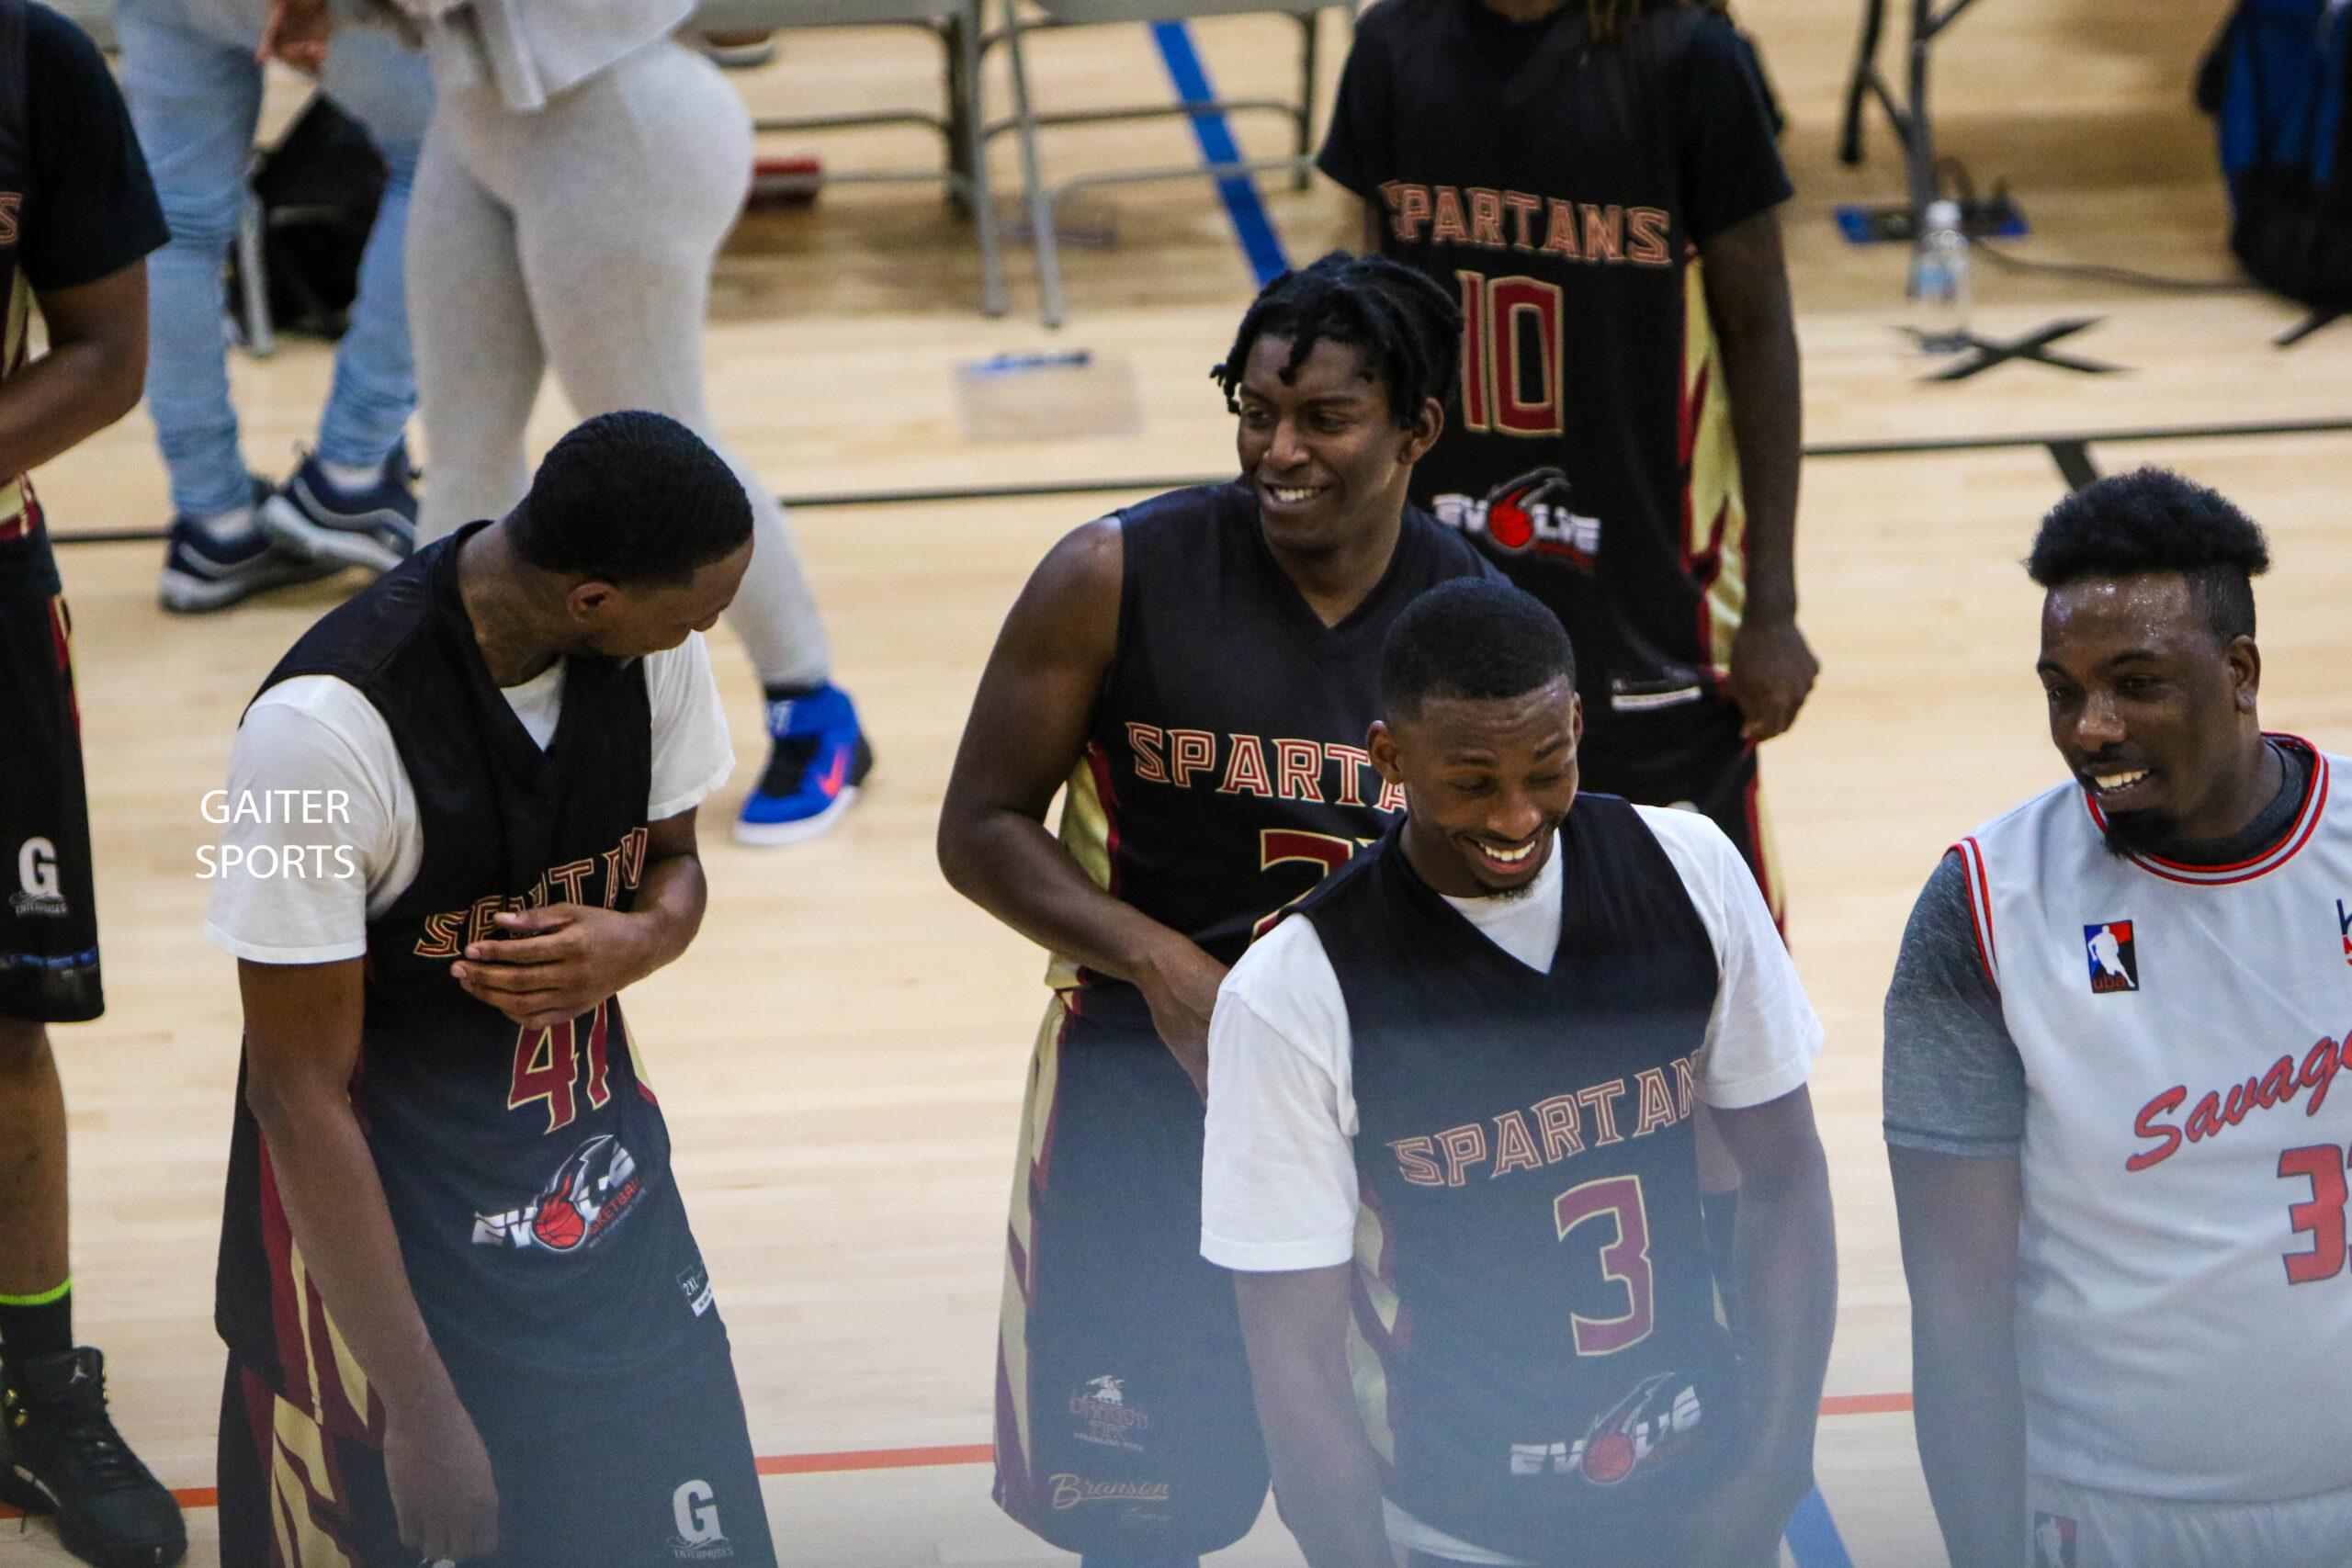 2019 Celebrity Basketball Game Georgia Spartans 32